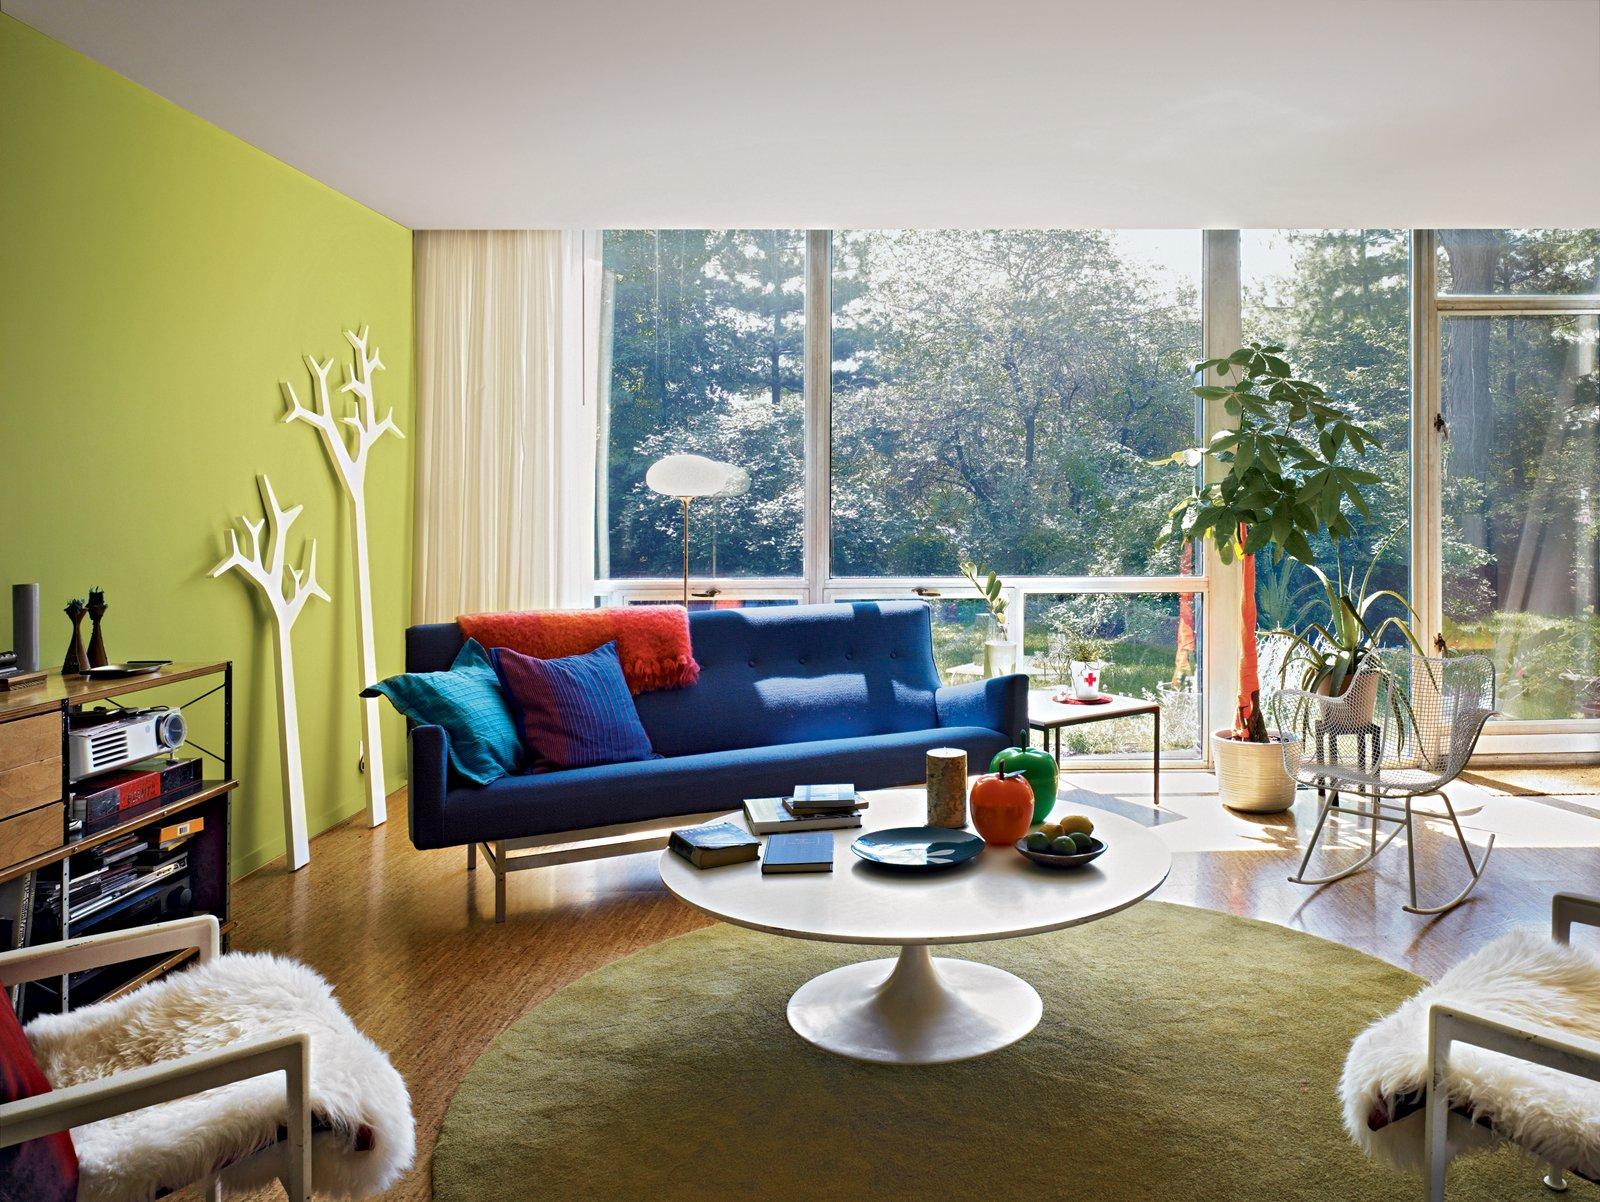 #interior #design #interiordesign #modern #livingroom #color #designwithcolor #rockingchair #green #blue #sofa #rug #orange #red #plants #stereo #treecoathangers #michaelyoung #katrinpetursdottir #foliage #outside #exterior #furchair #vintage #furniture  36+ Interior Color Pop Ideas For Modern Homes by Dwell